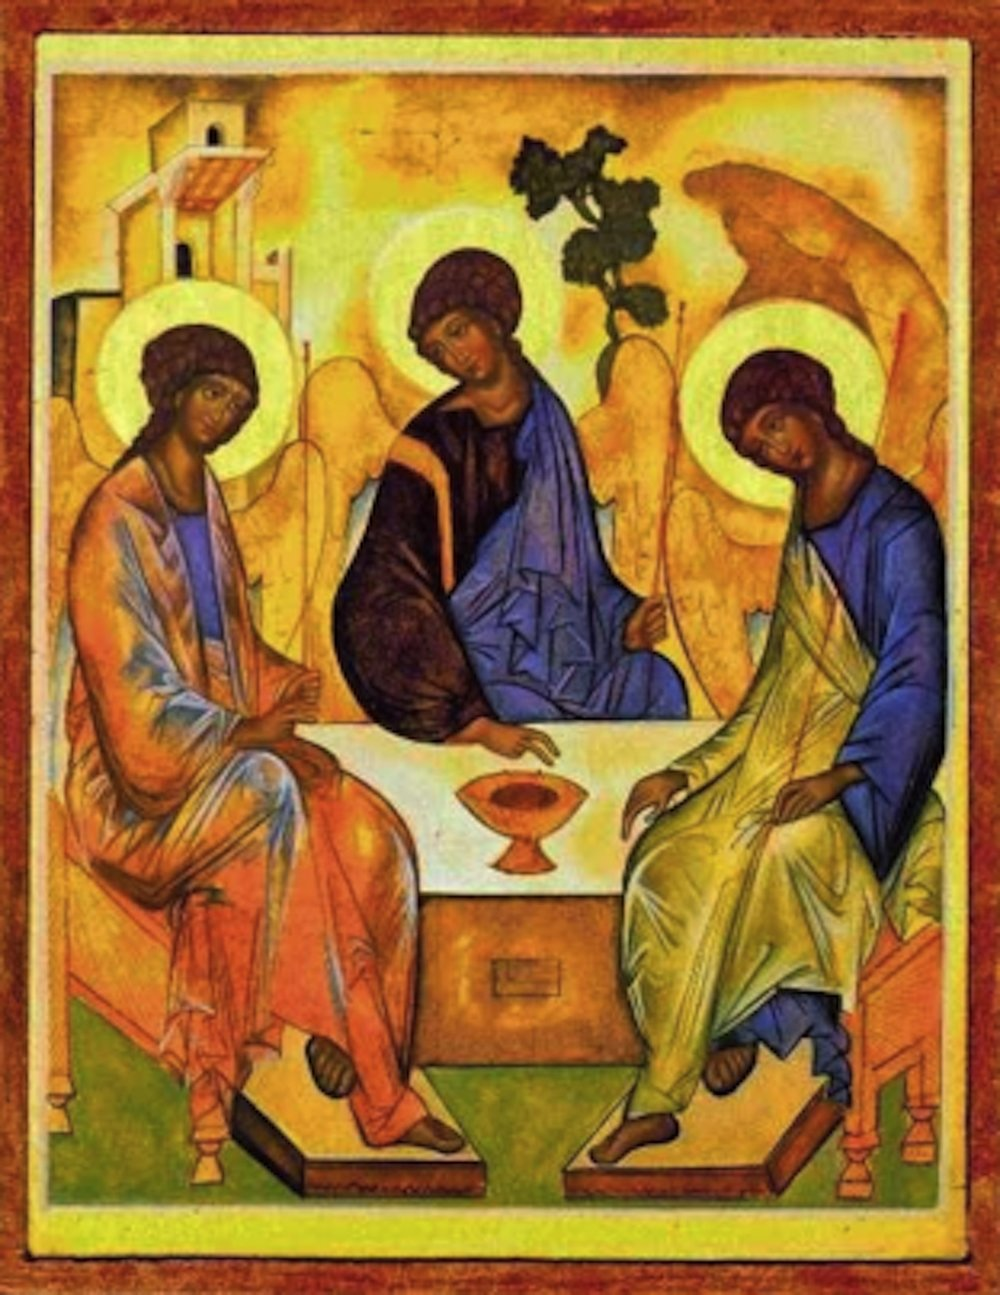 Rublev's Holy Trinity